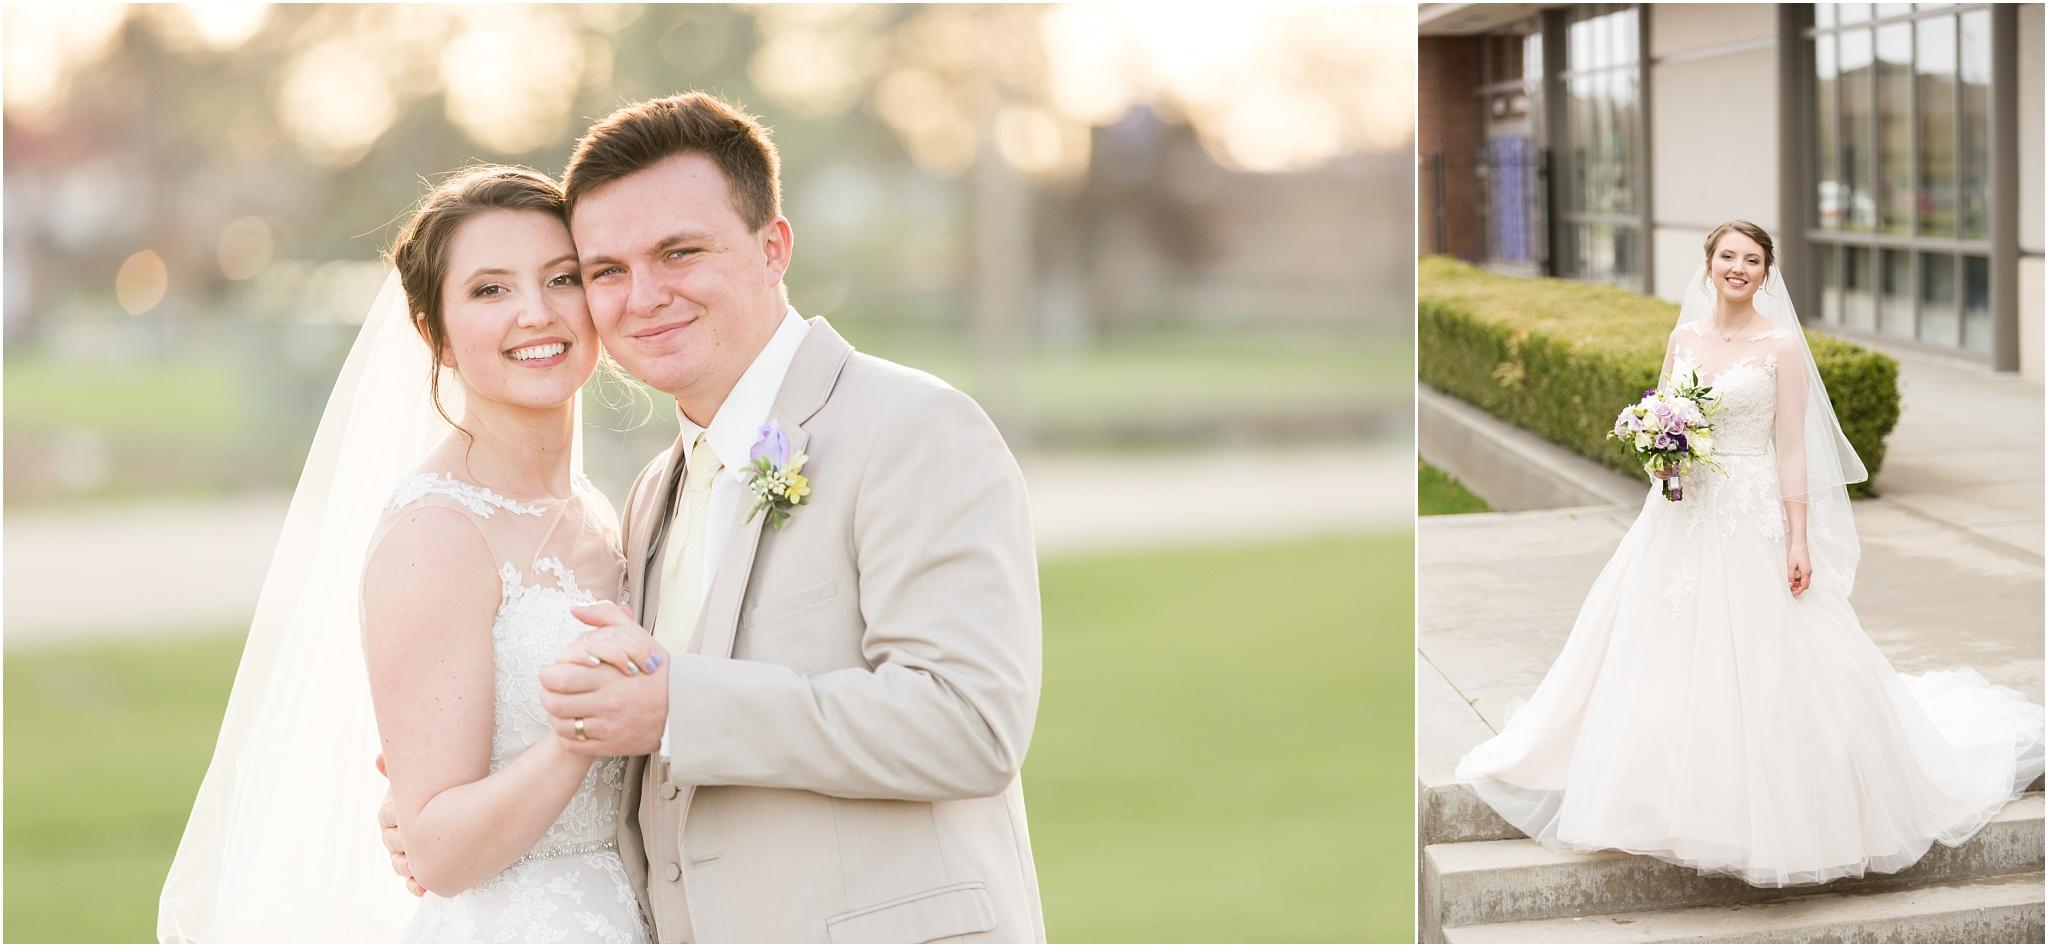 Wedding Photography_Meridian Idaho_Nampa Idaho_Leah Southwick Photography_0069.jpg